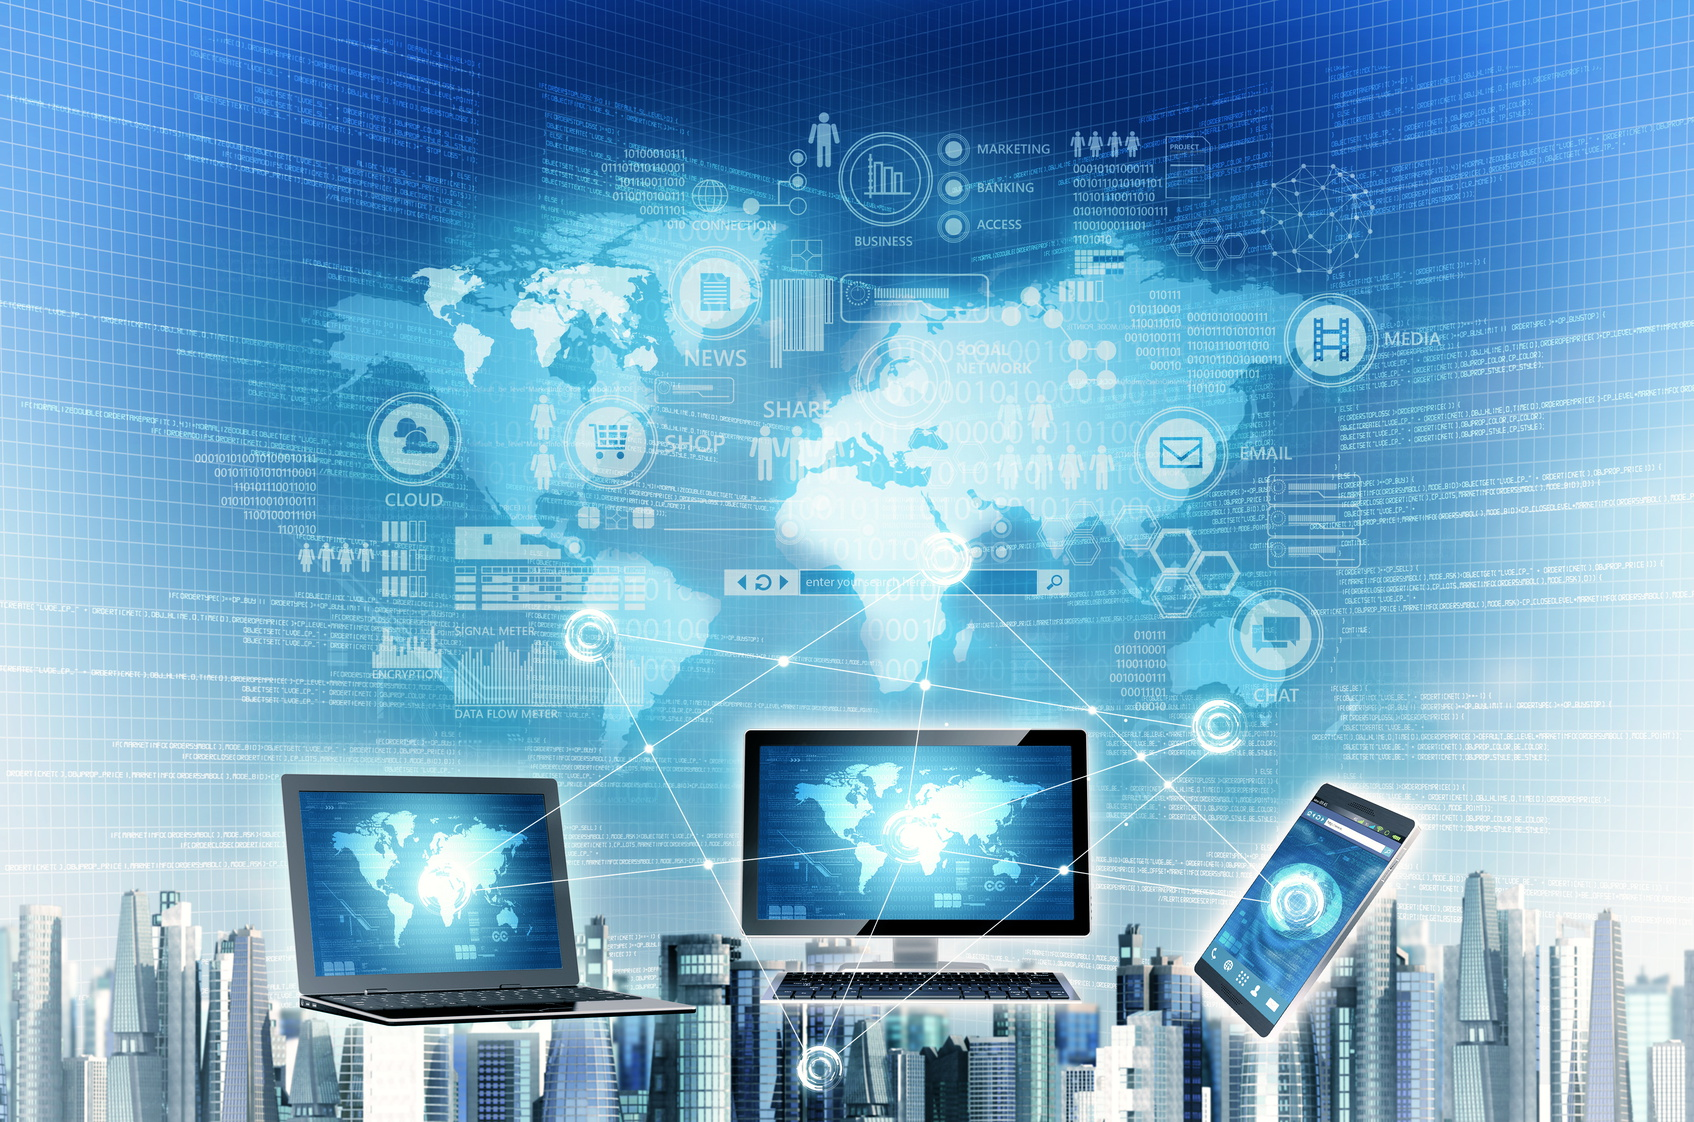 Infrastruktura telekomunikacyjna